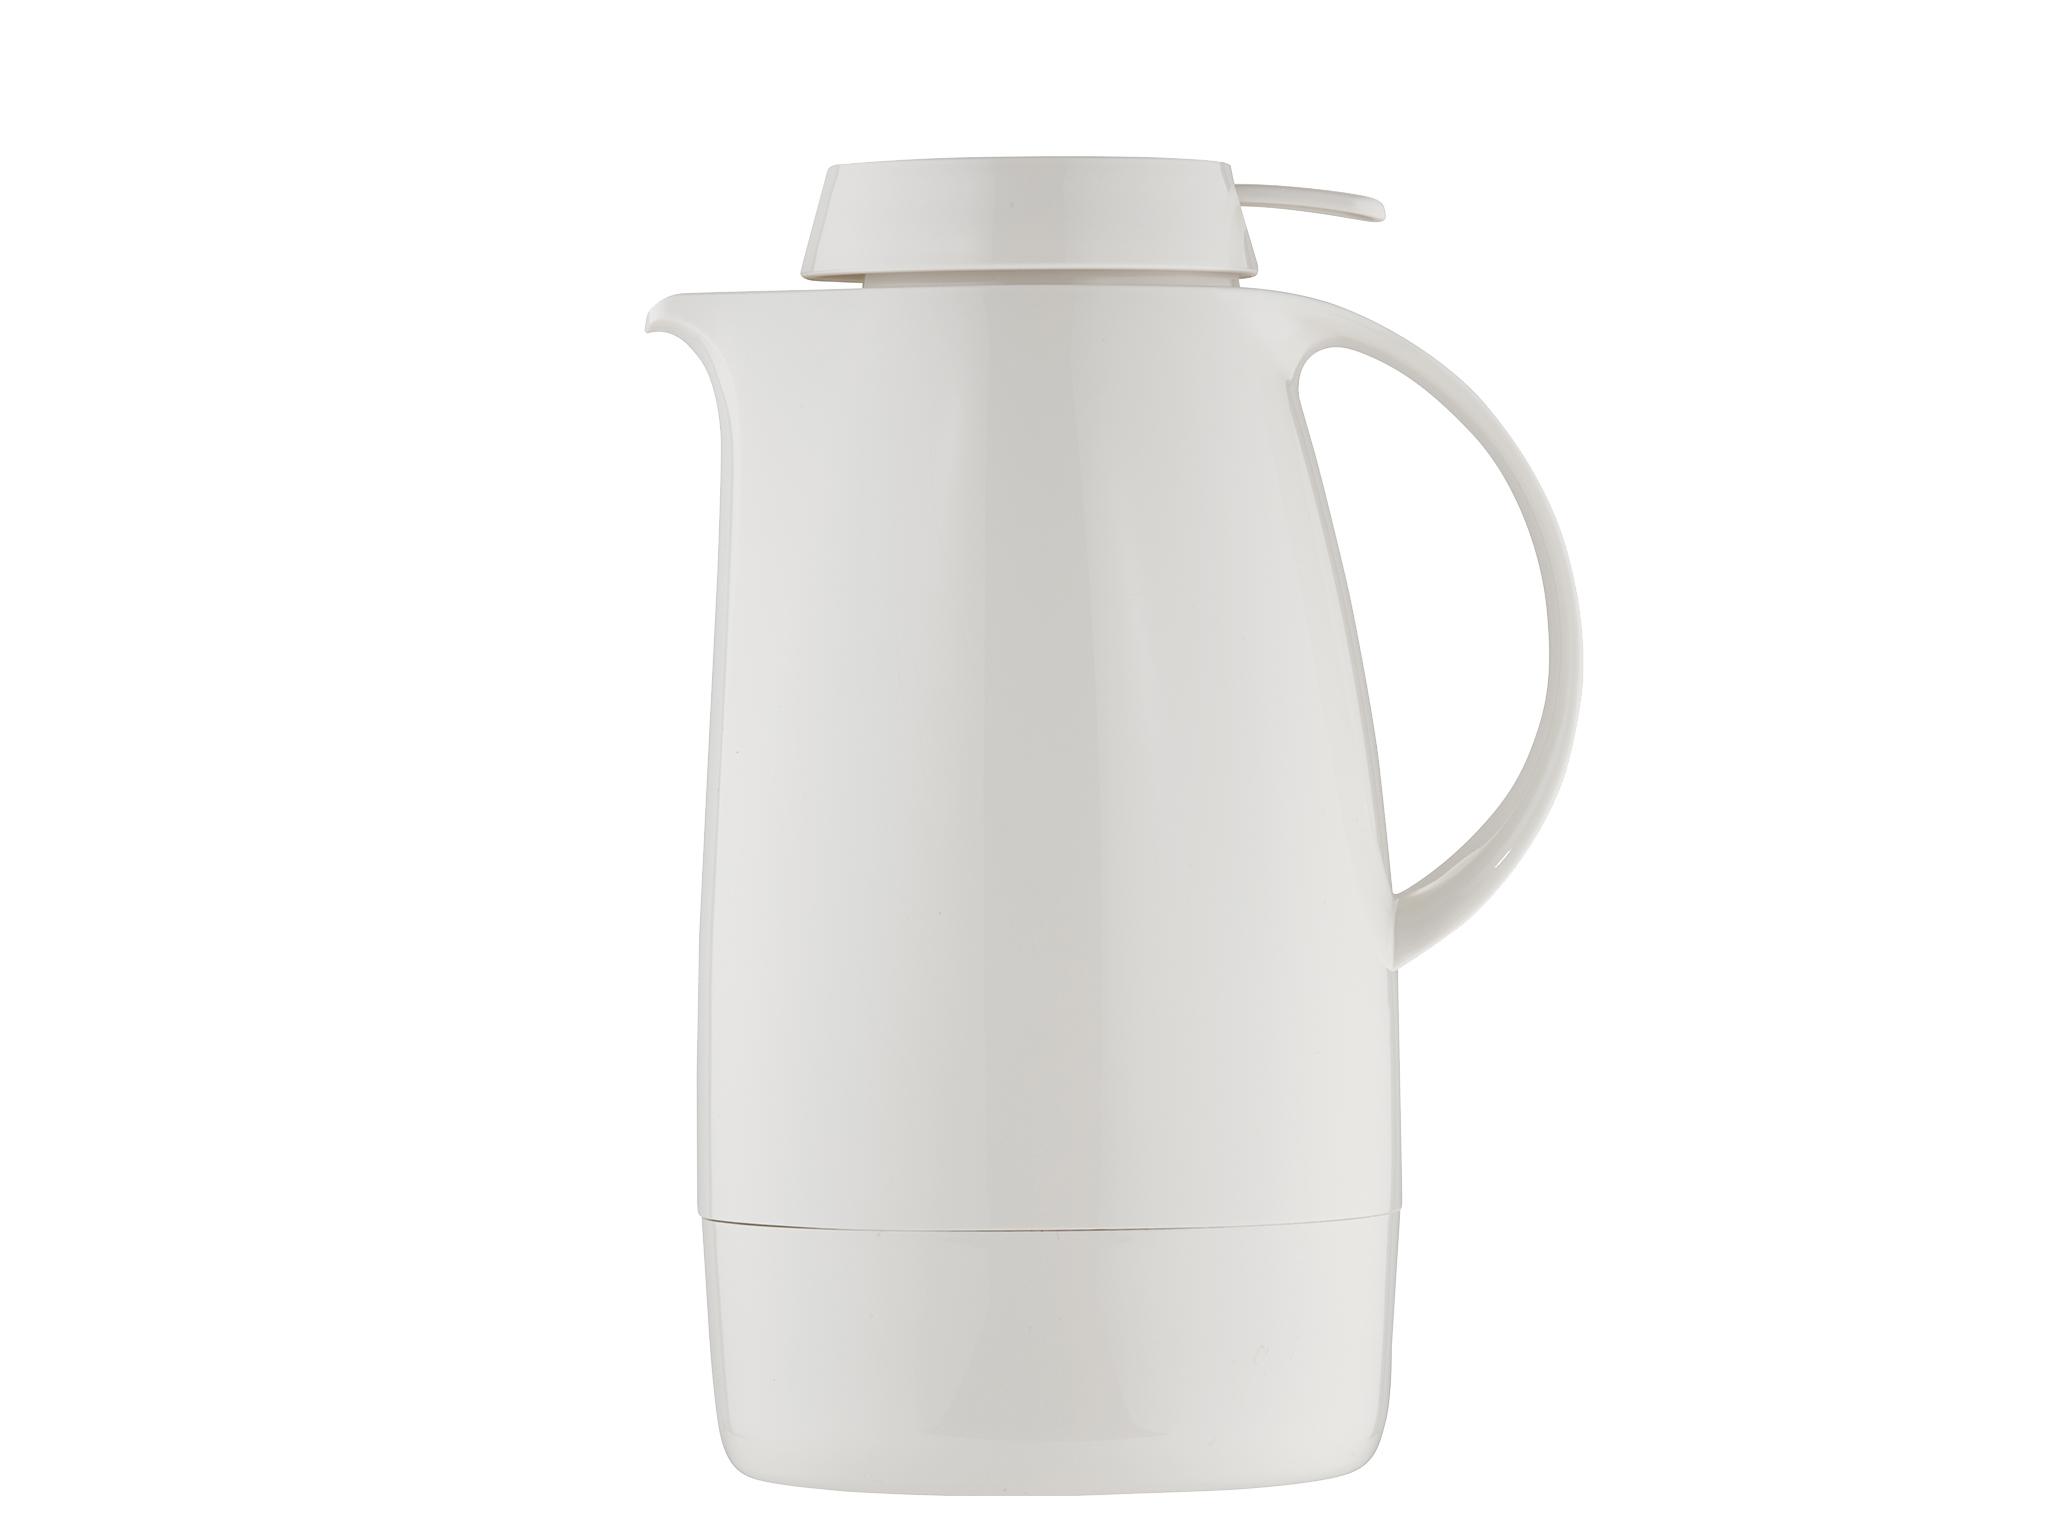 7205-001 - Vacuum carafe white 1.3 L SERVITHERM - Helios